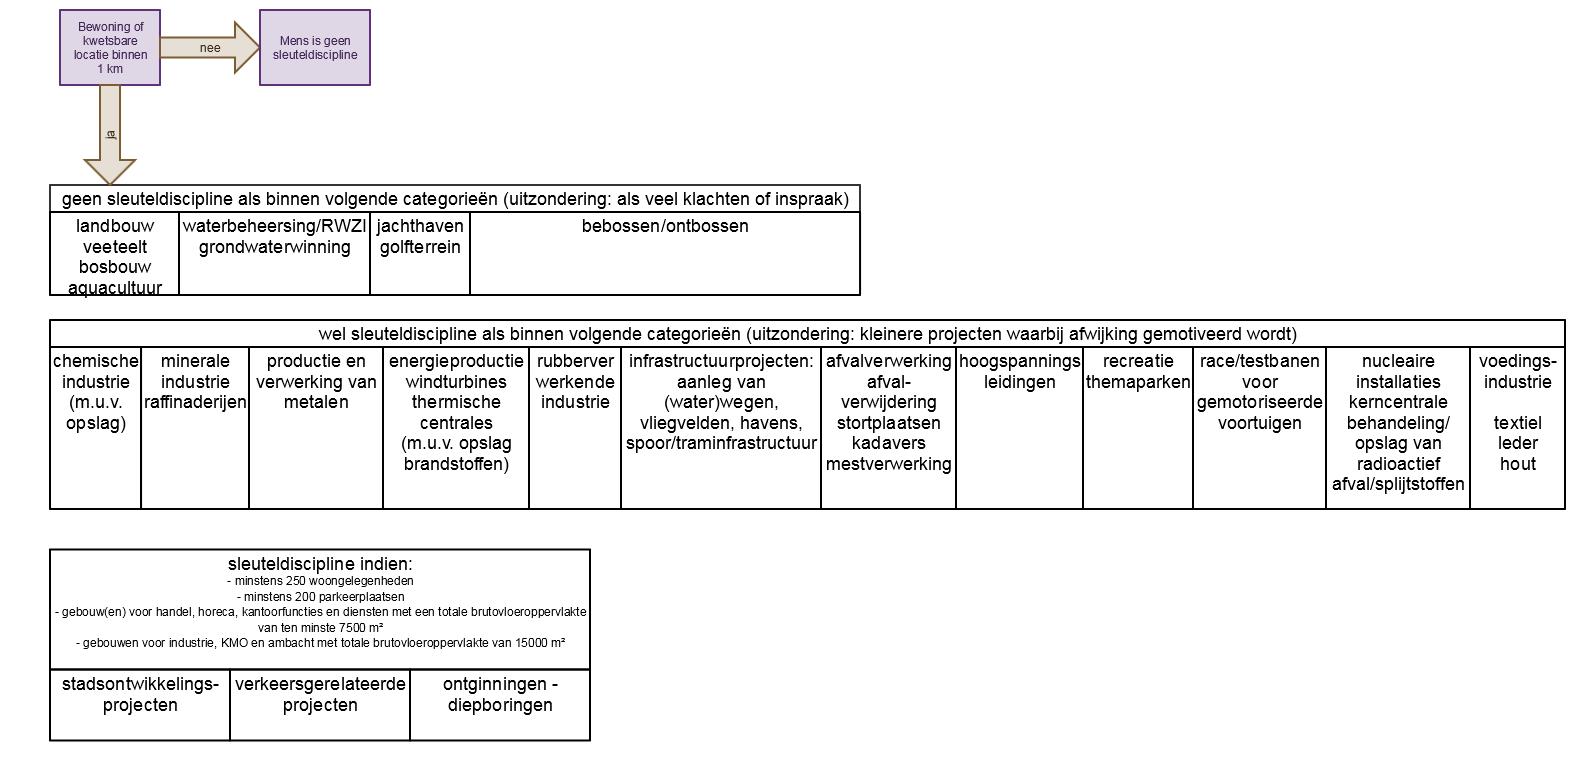 stroomdiagram wanneer deskundige mens nodig - MER-richtlijnensysteem ...